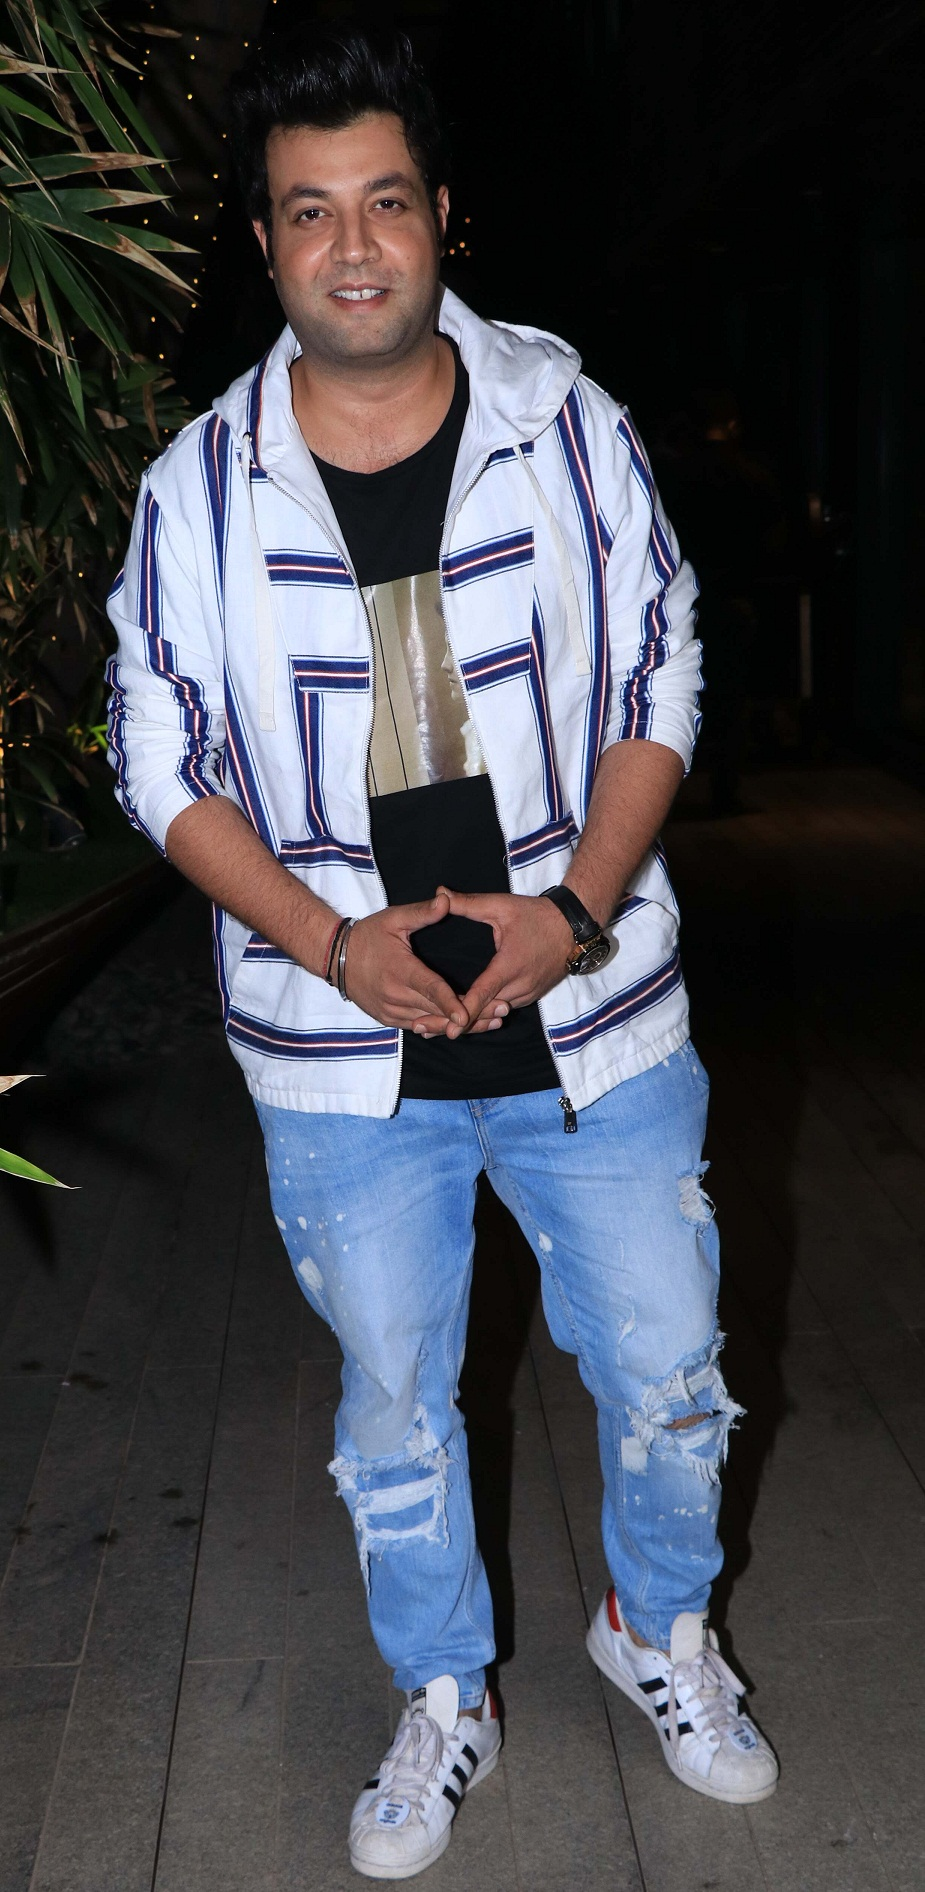 Bollywood Tadka, नुसरत बरुचा इमेज, नुसरत बरुचा फोटो, नुसरत बरुचा पिक्चर